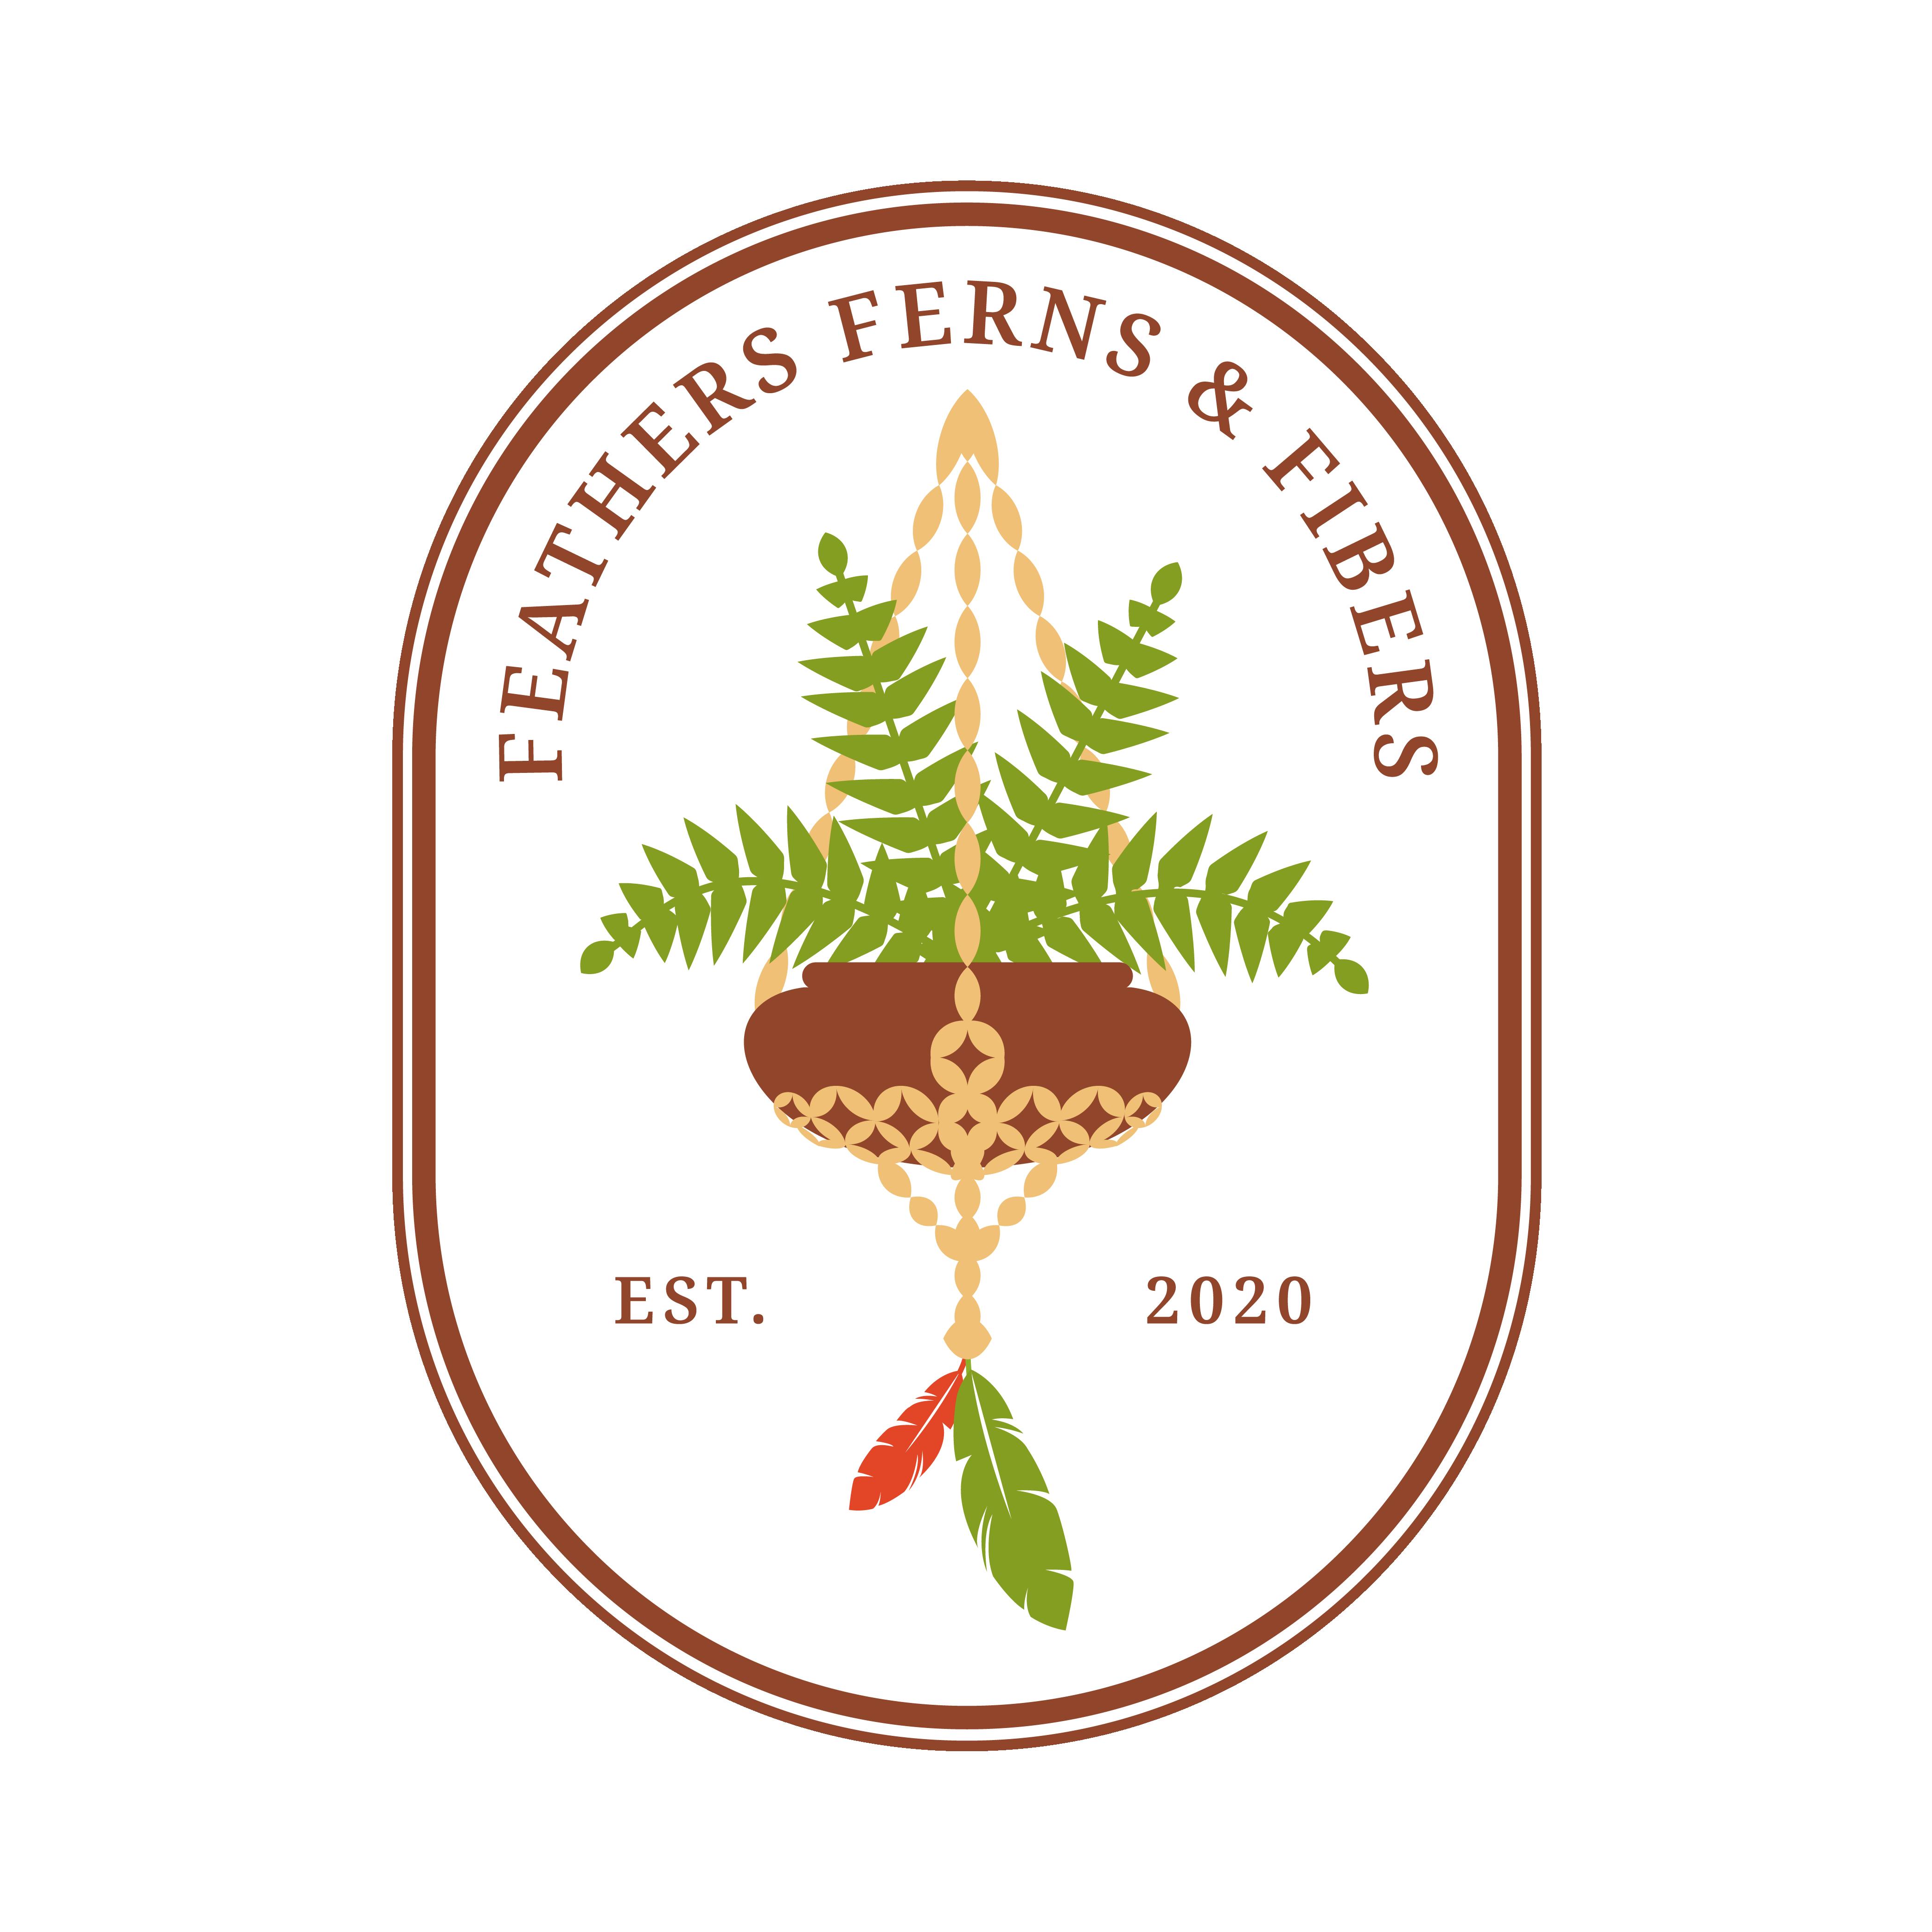 Feathers Ferns & Fibers